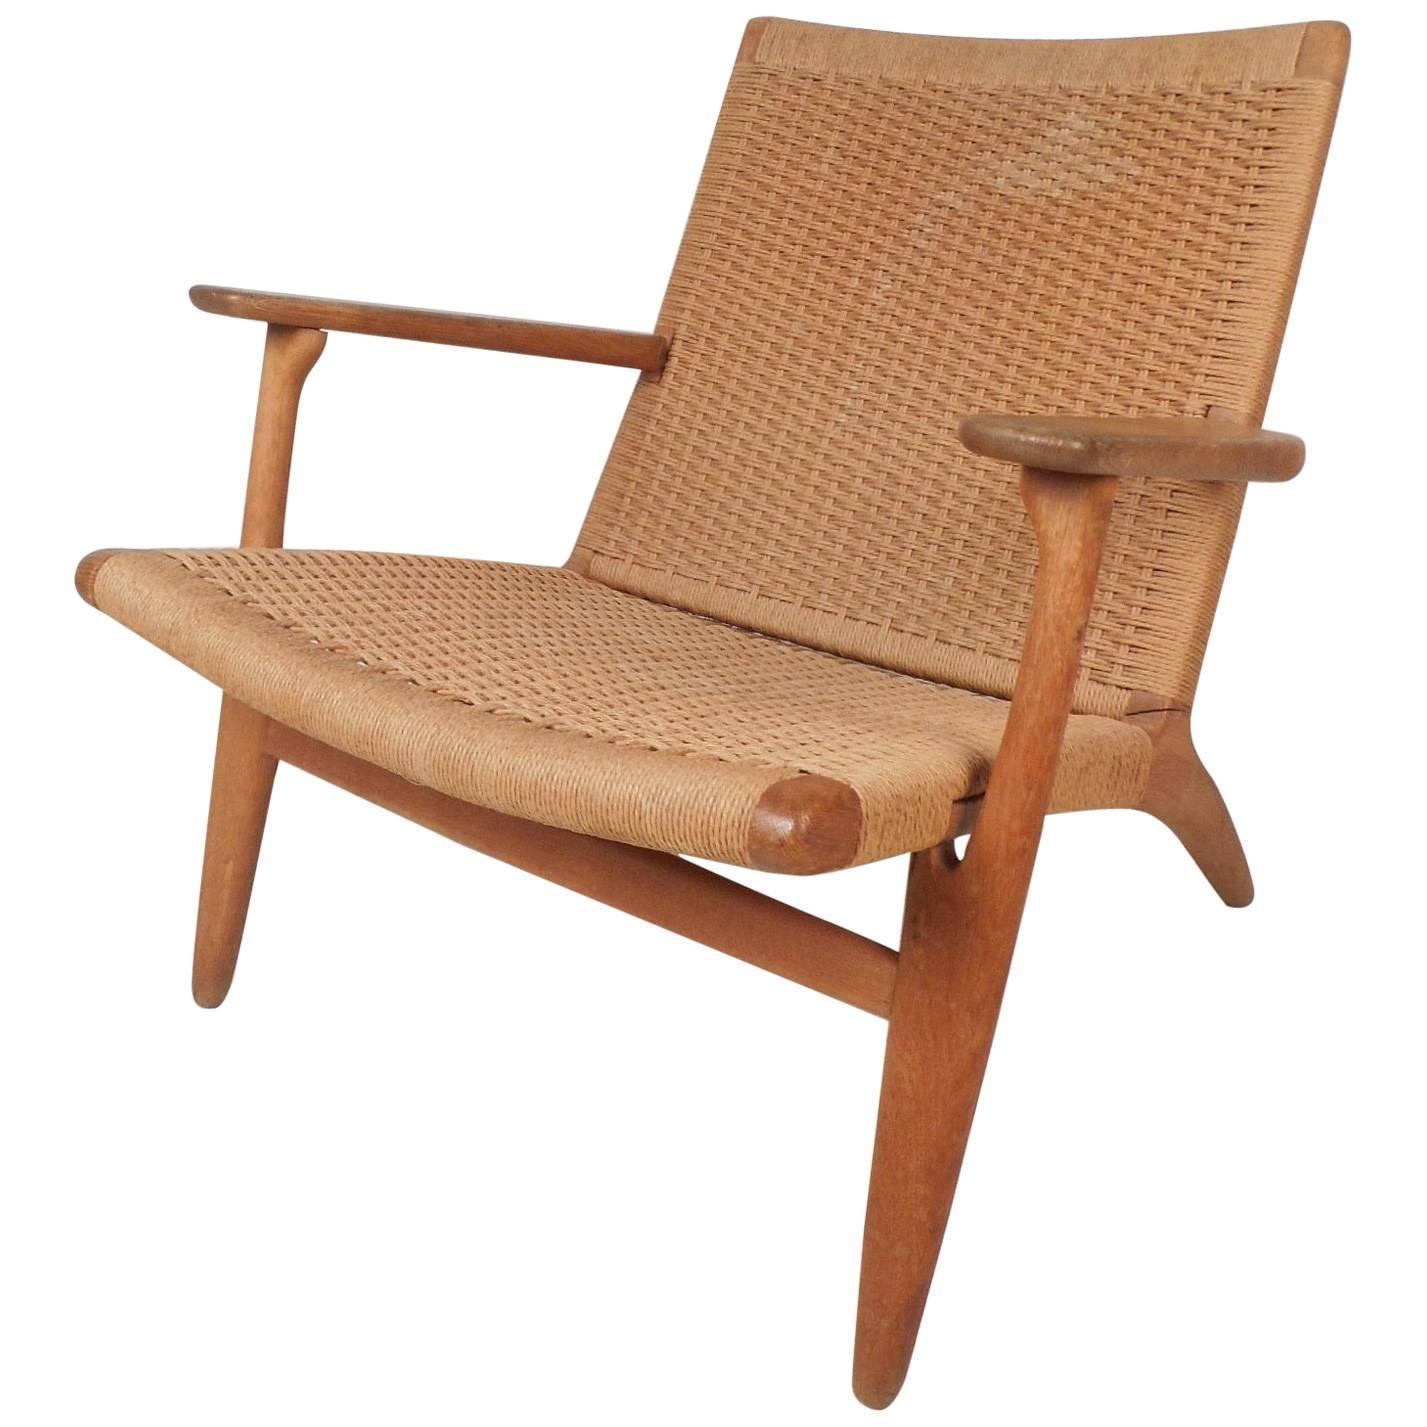 Mid-Century Modern CH 25 Lounge Chair by Hans Wegner for Carl Hansen